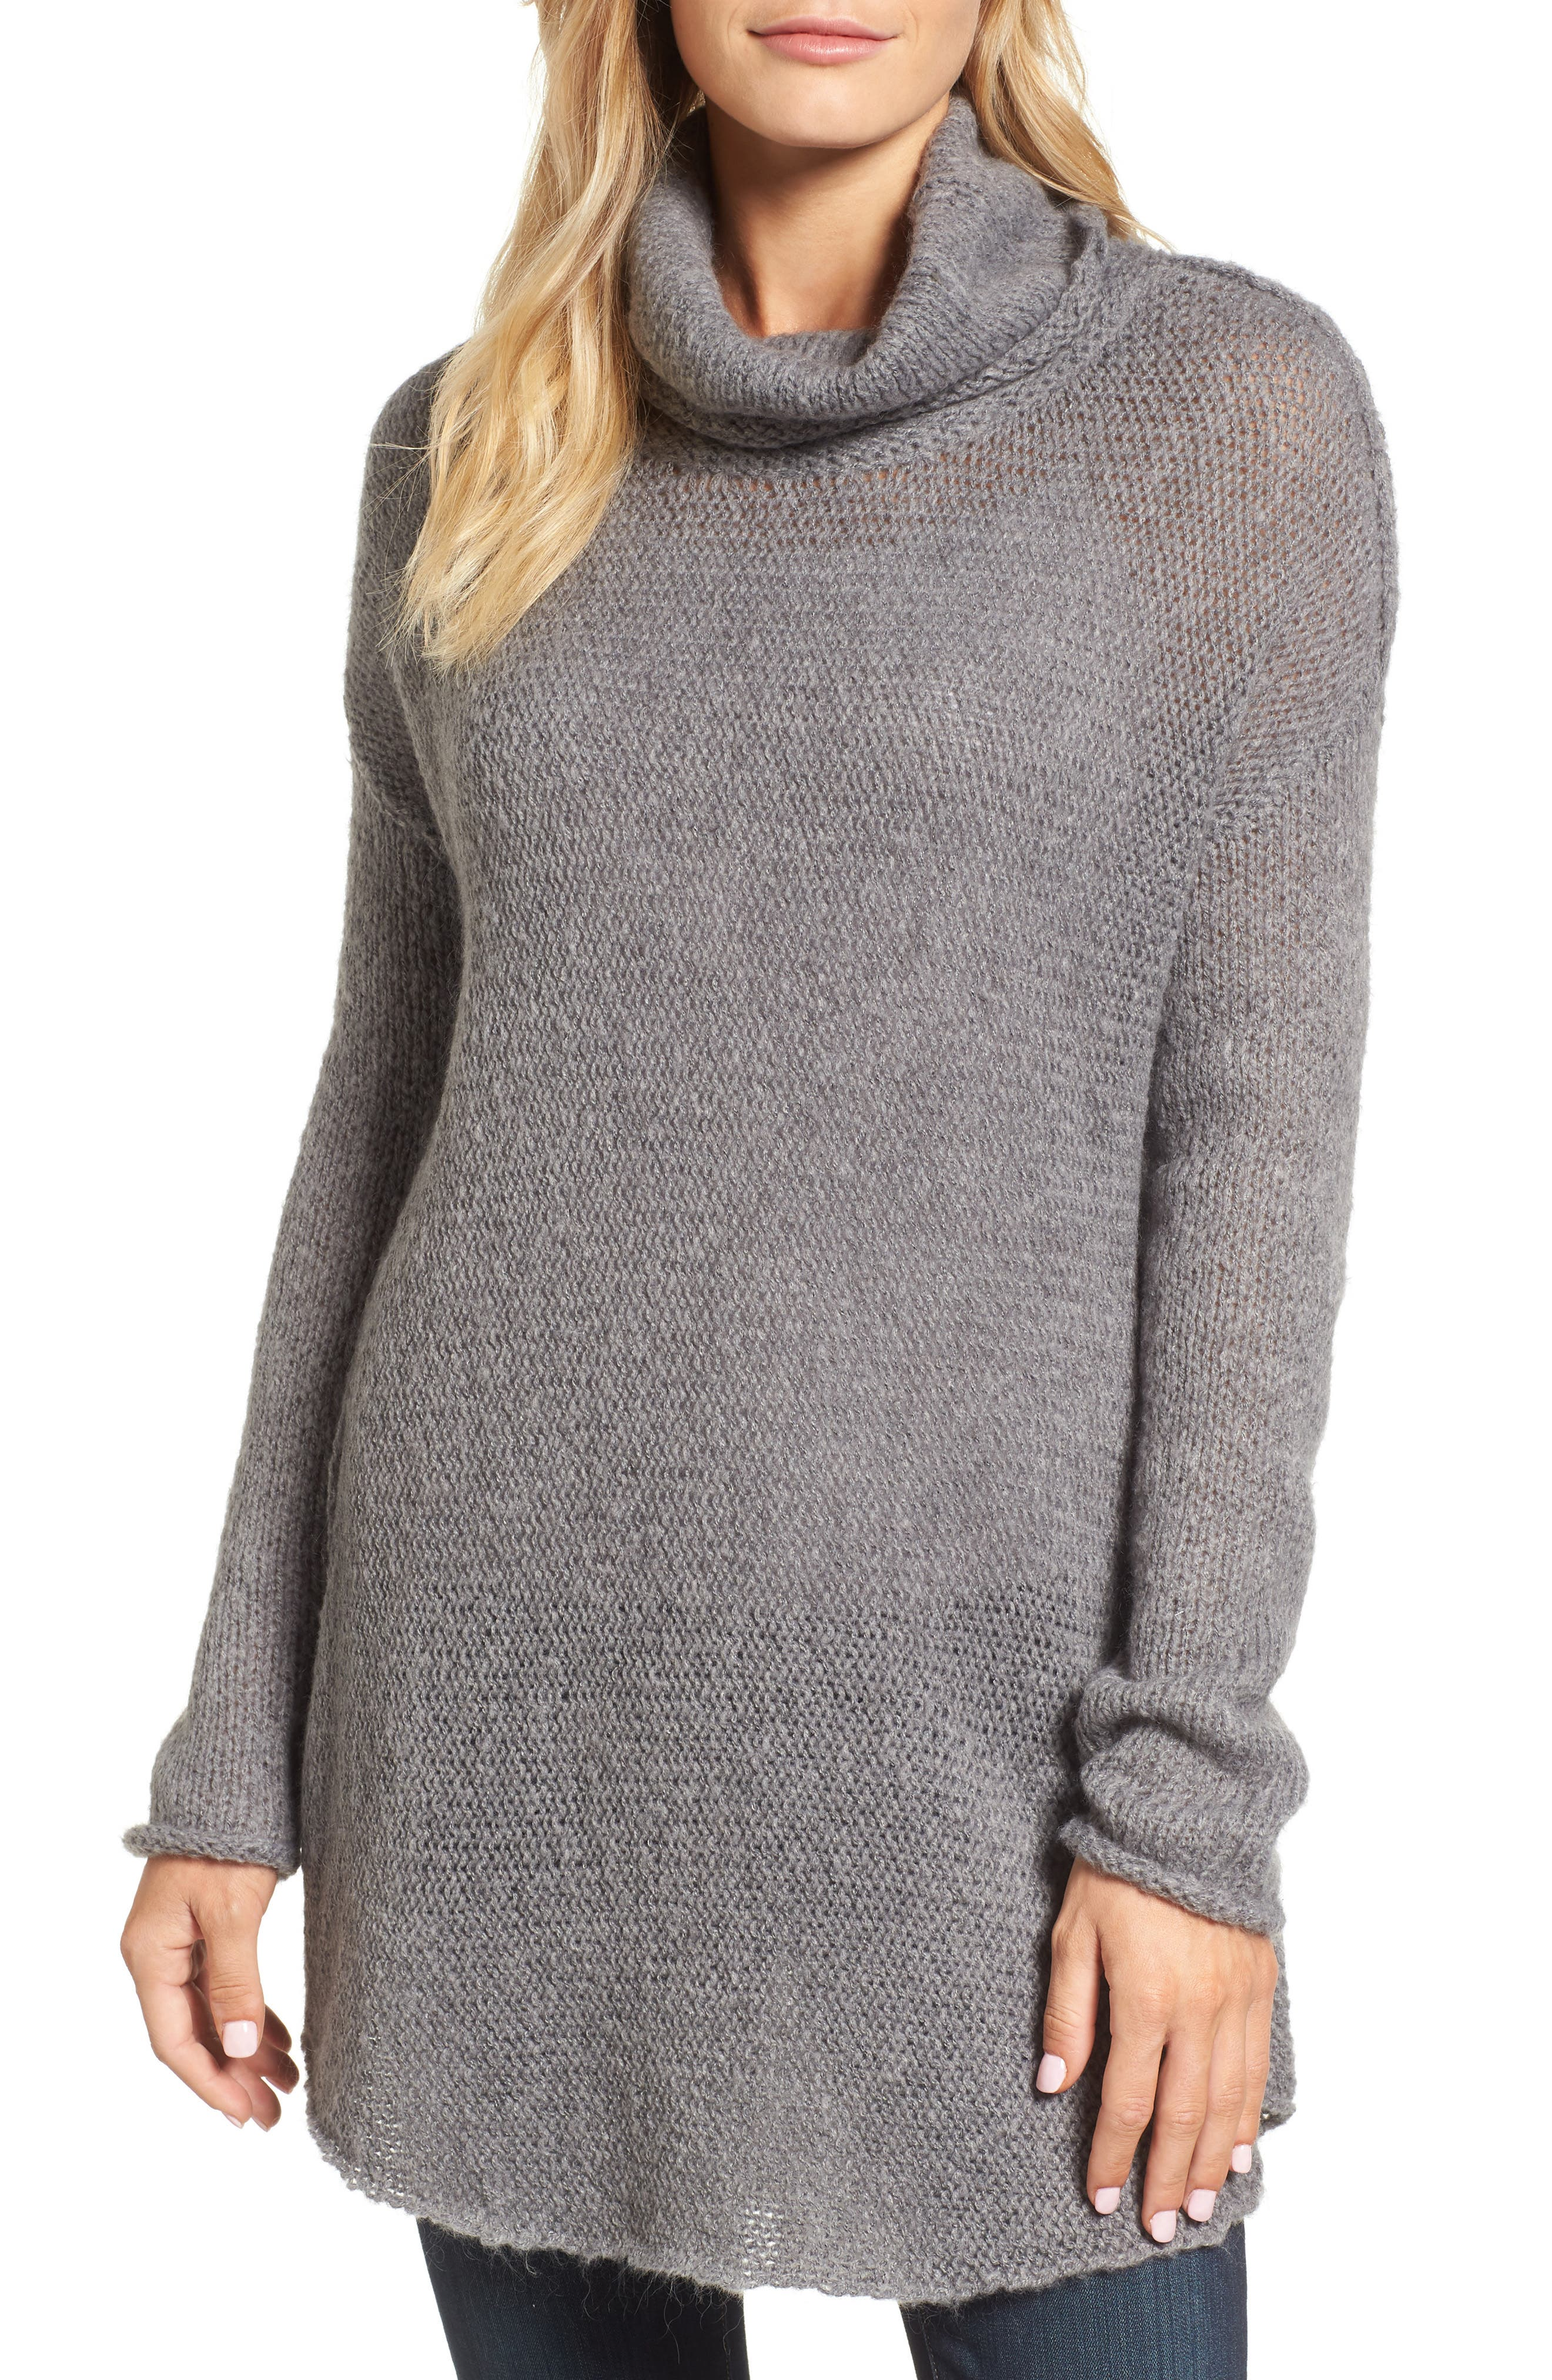 Tunic Sweater,                             Main thumbnail 1, color,                             GREY DARK HEATHER